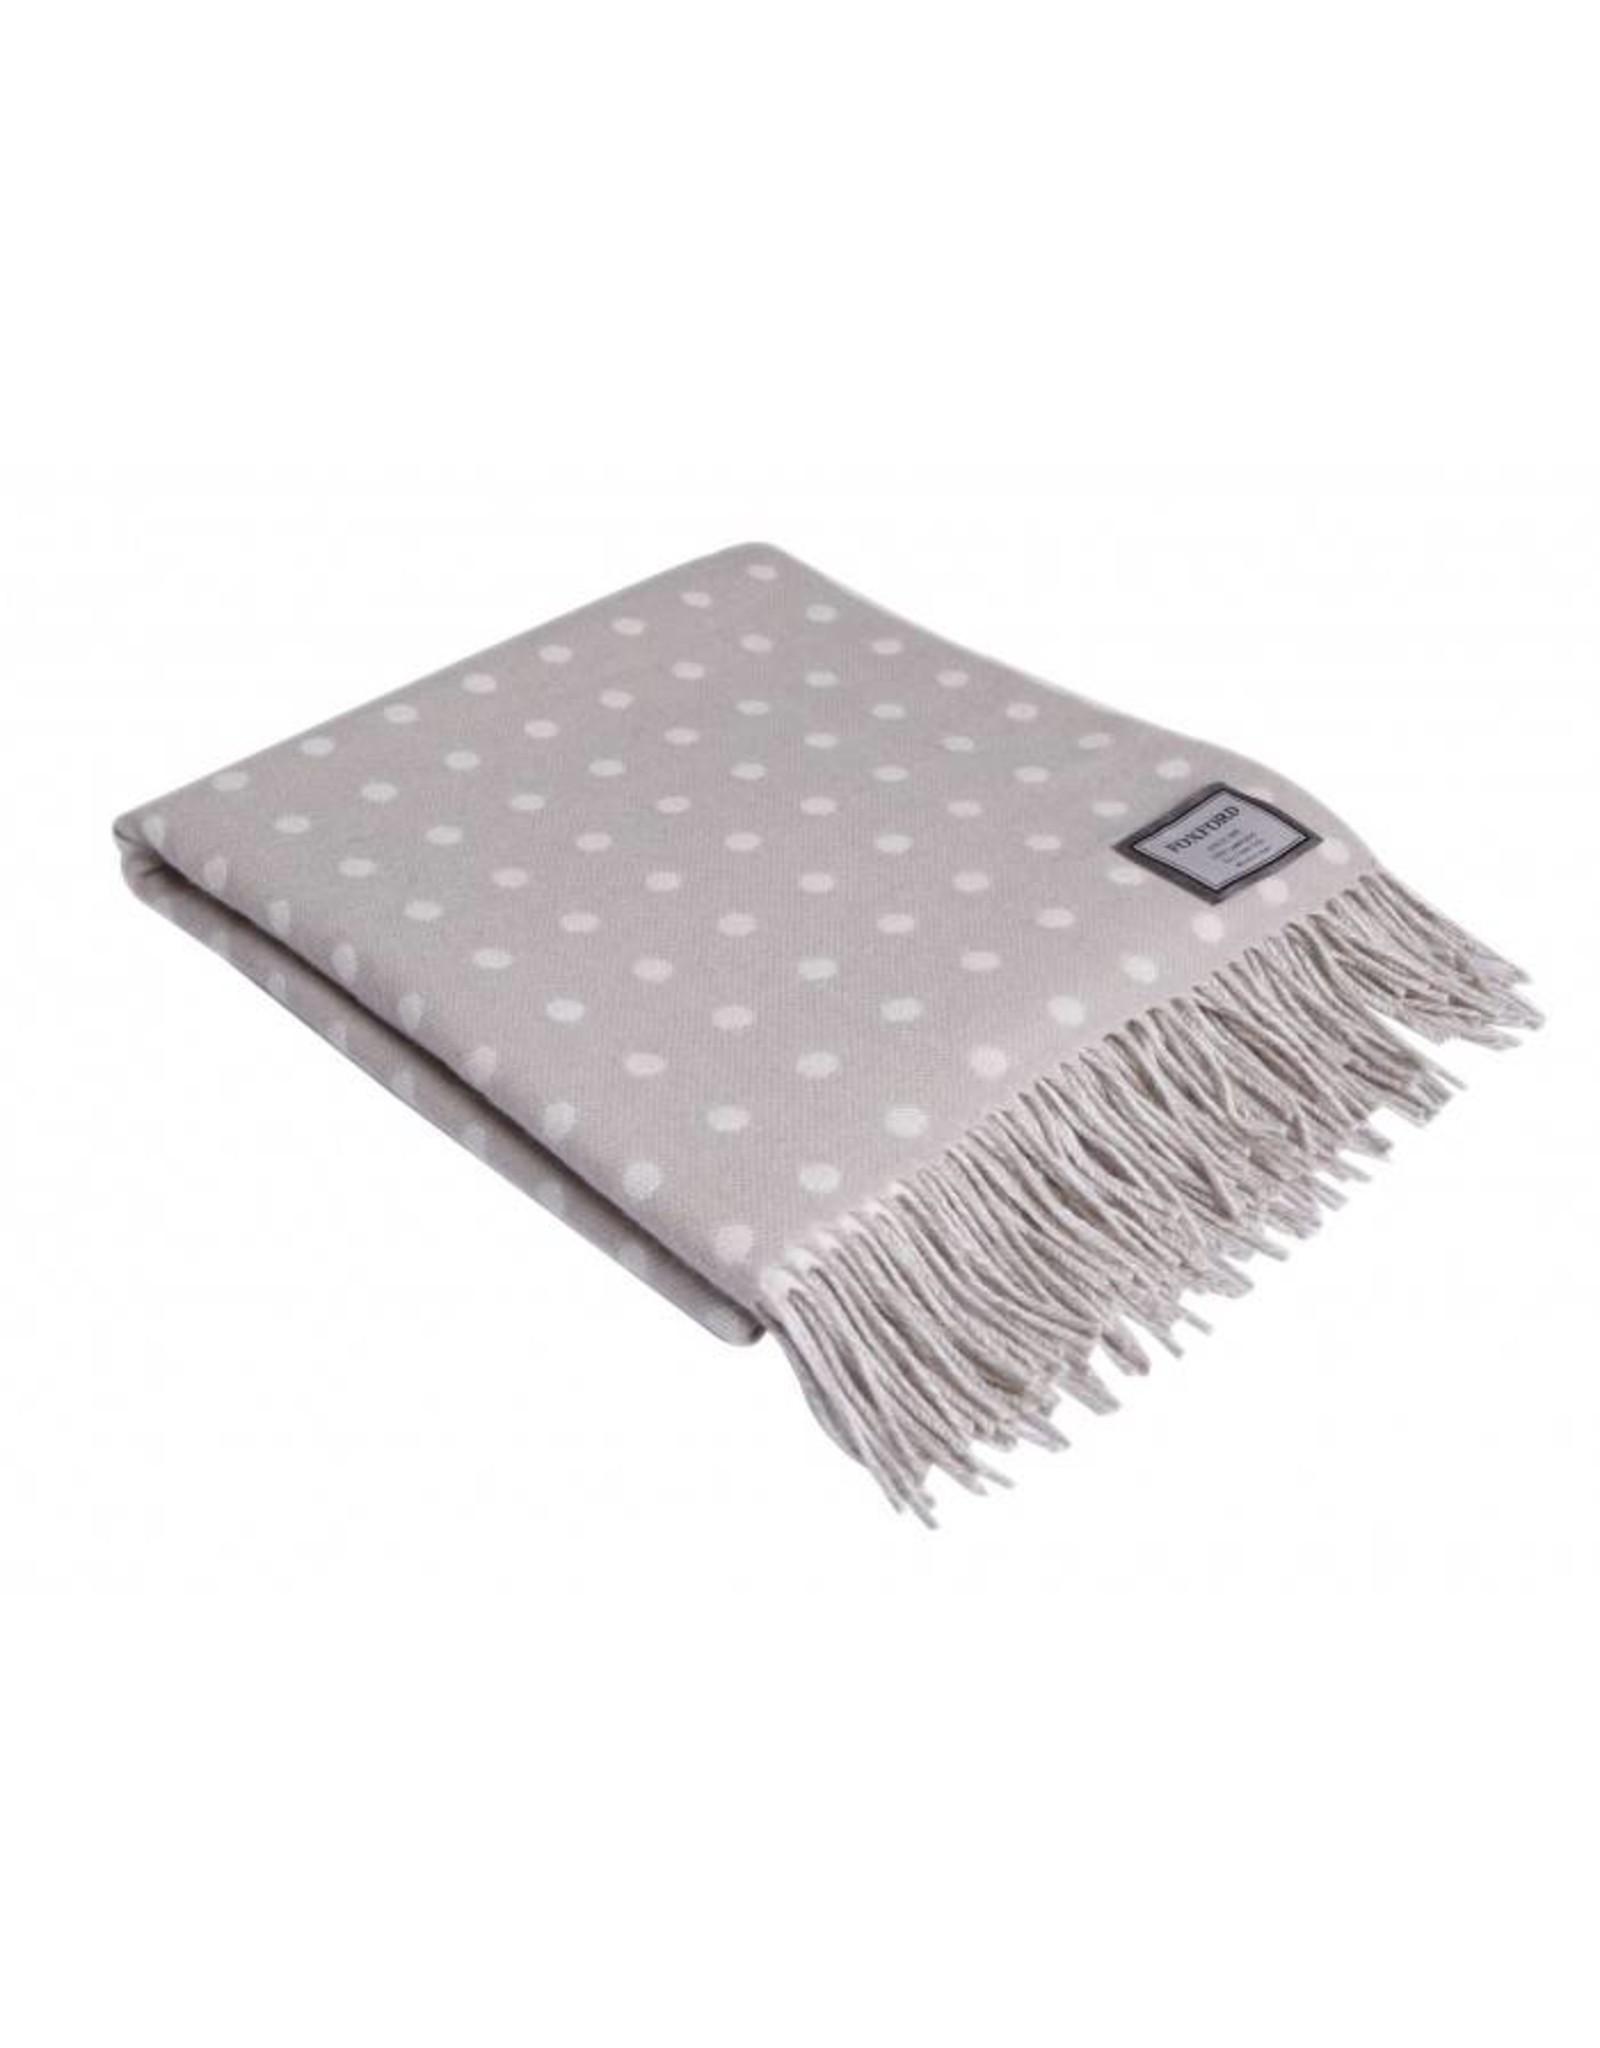 Foxford Lambswool Cream/Tan Polka Dot Throw Blanket